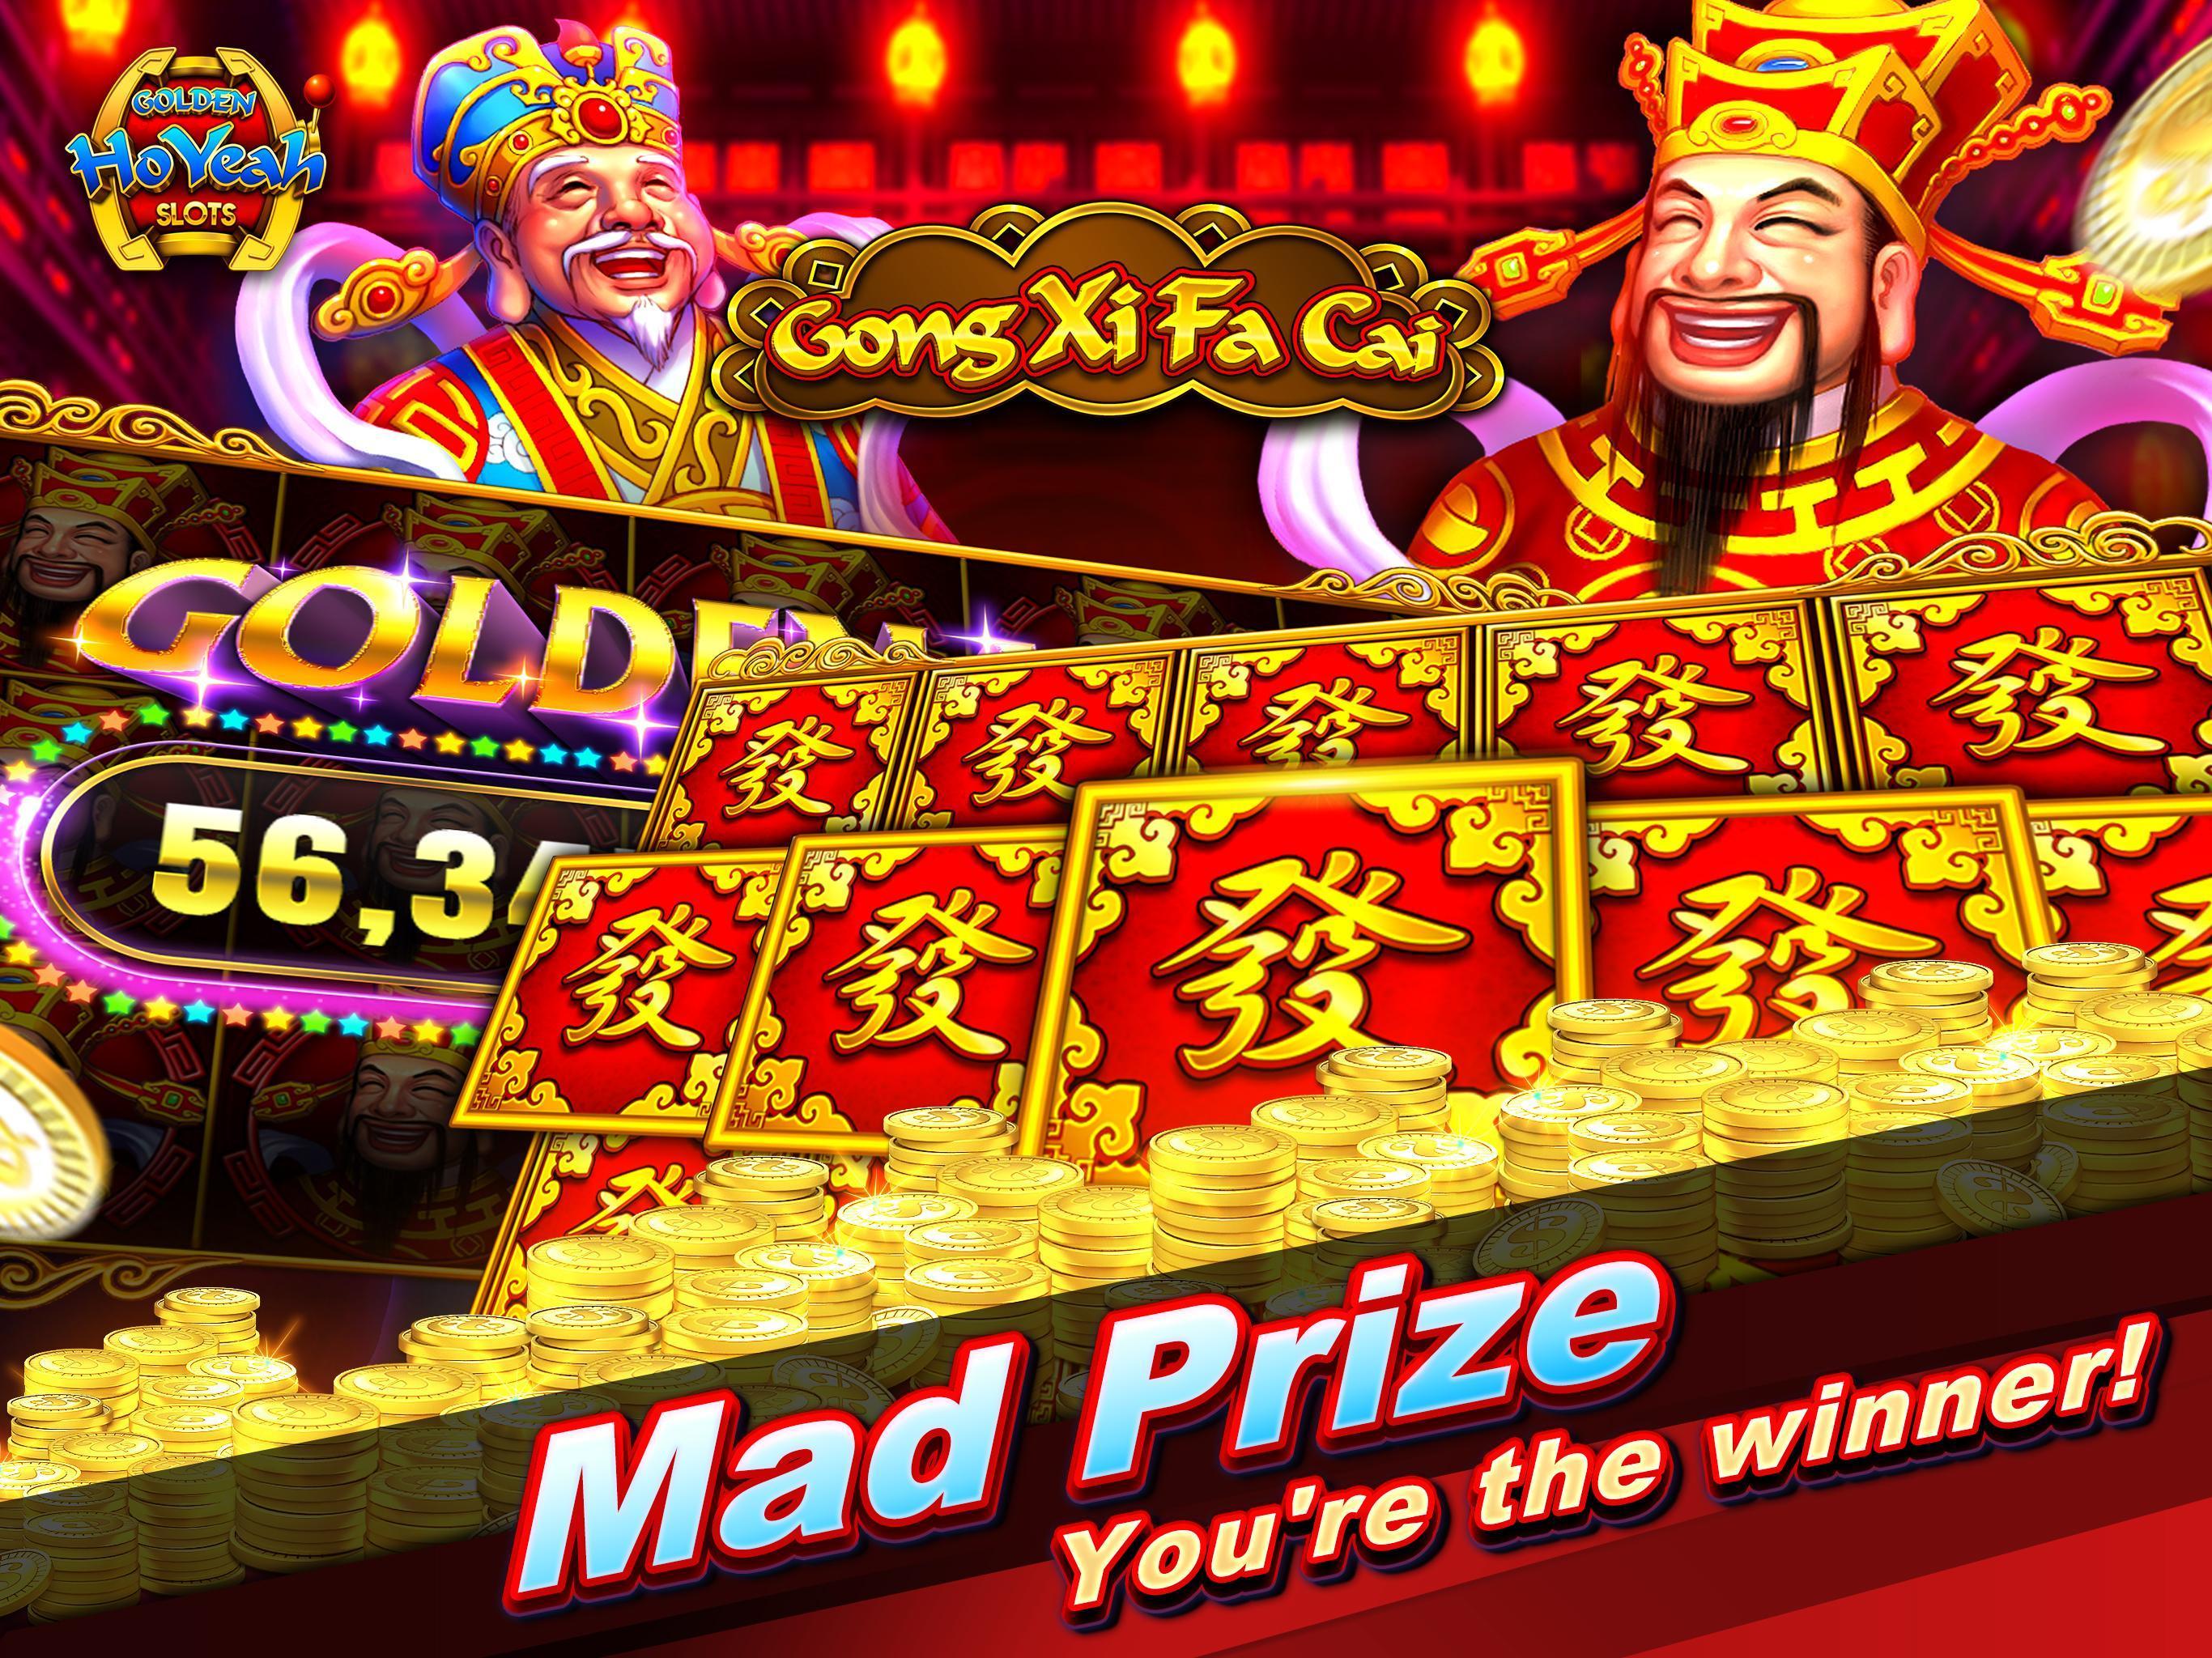 Slots (Golden HoYeah) - Casino Slots 2.5.7 Screenshot 10